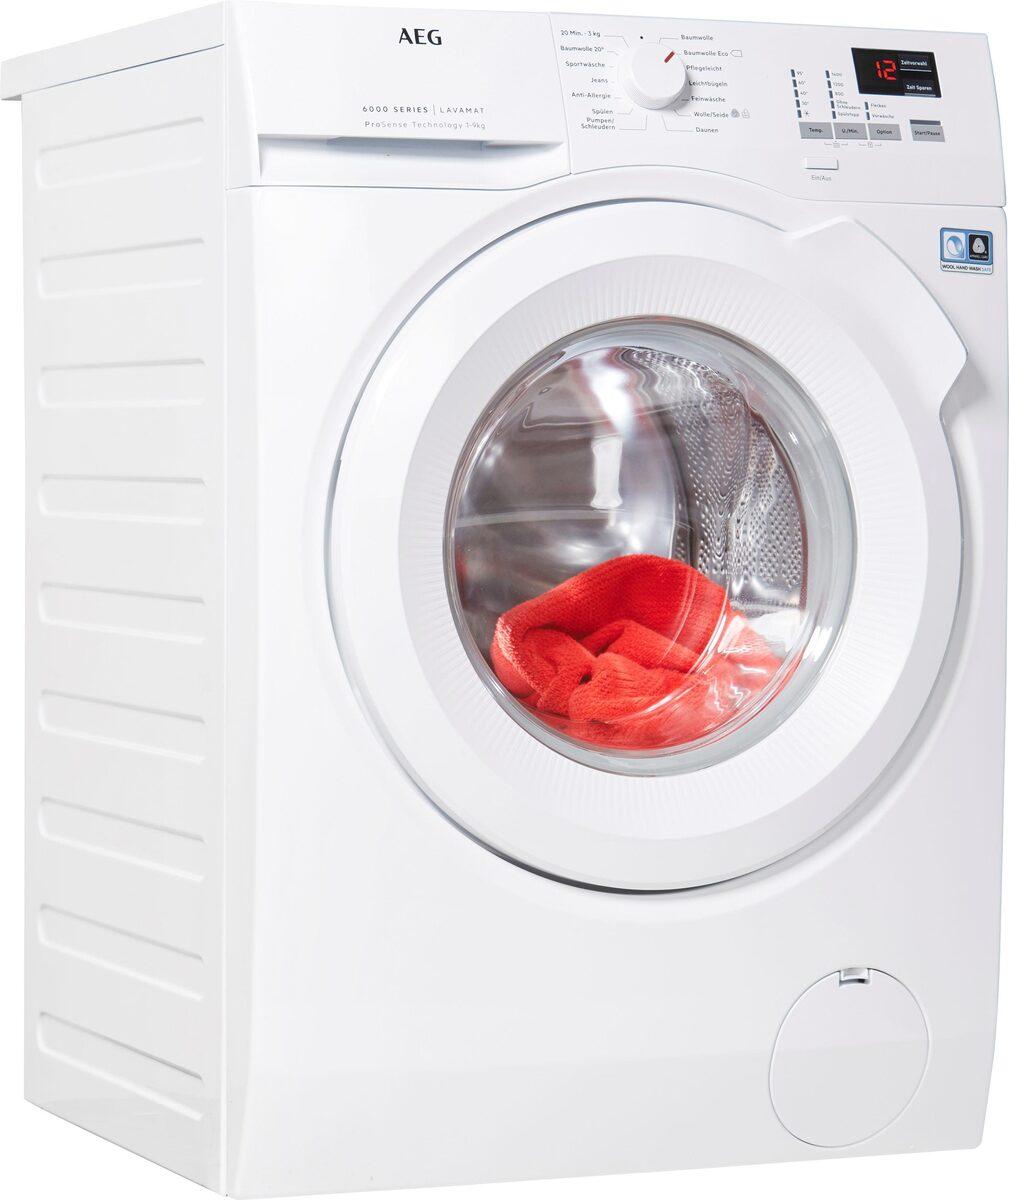 Bild 1 von AEG Waschmaschine L6FBA494, 9 kg, 1400 U/Min, ProSense - Mengenautomatik